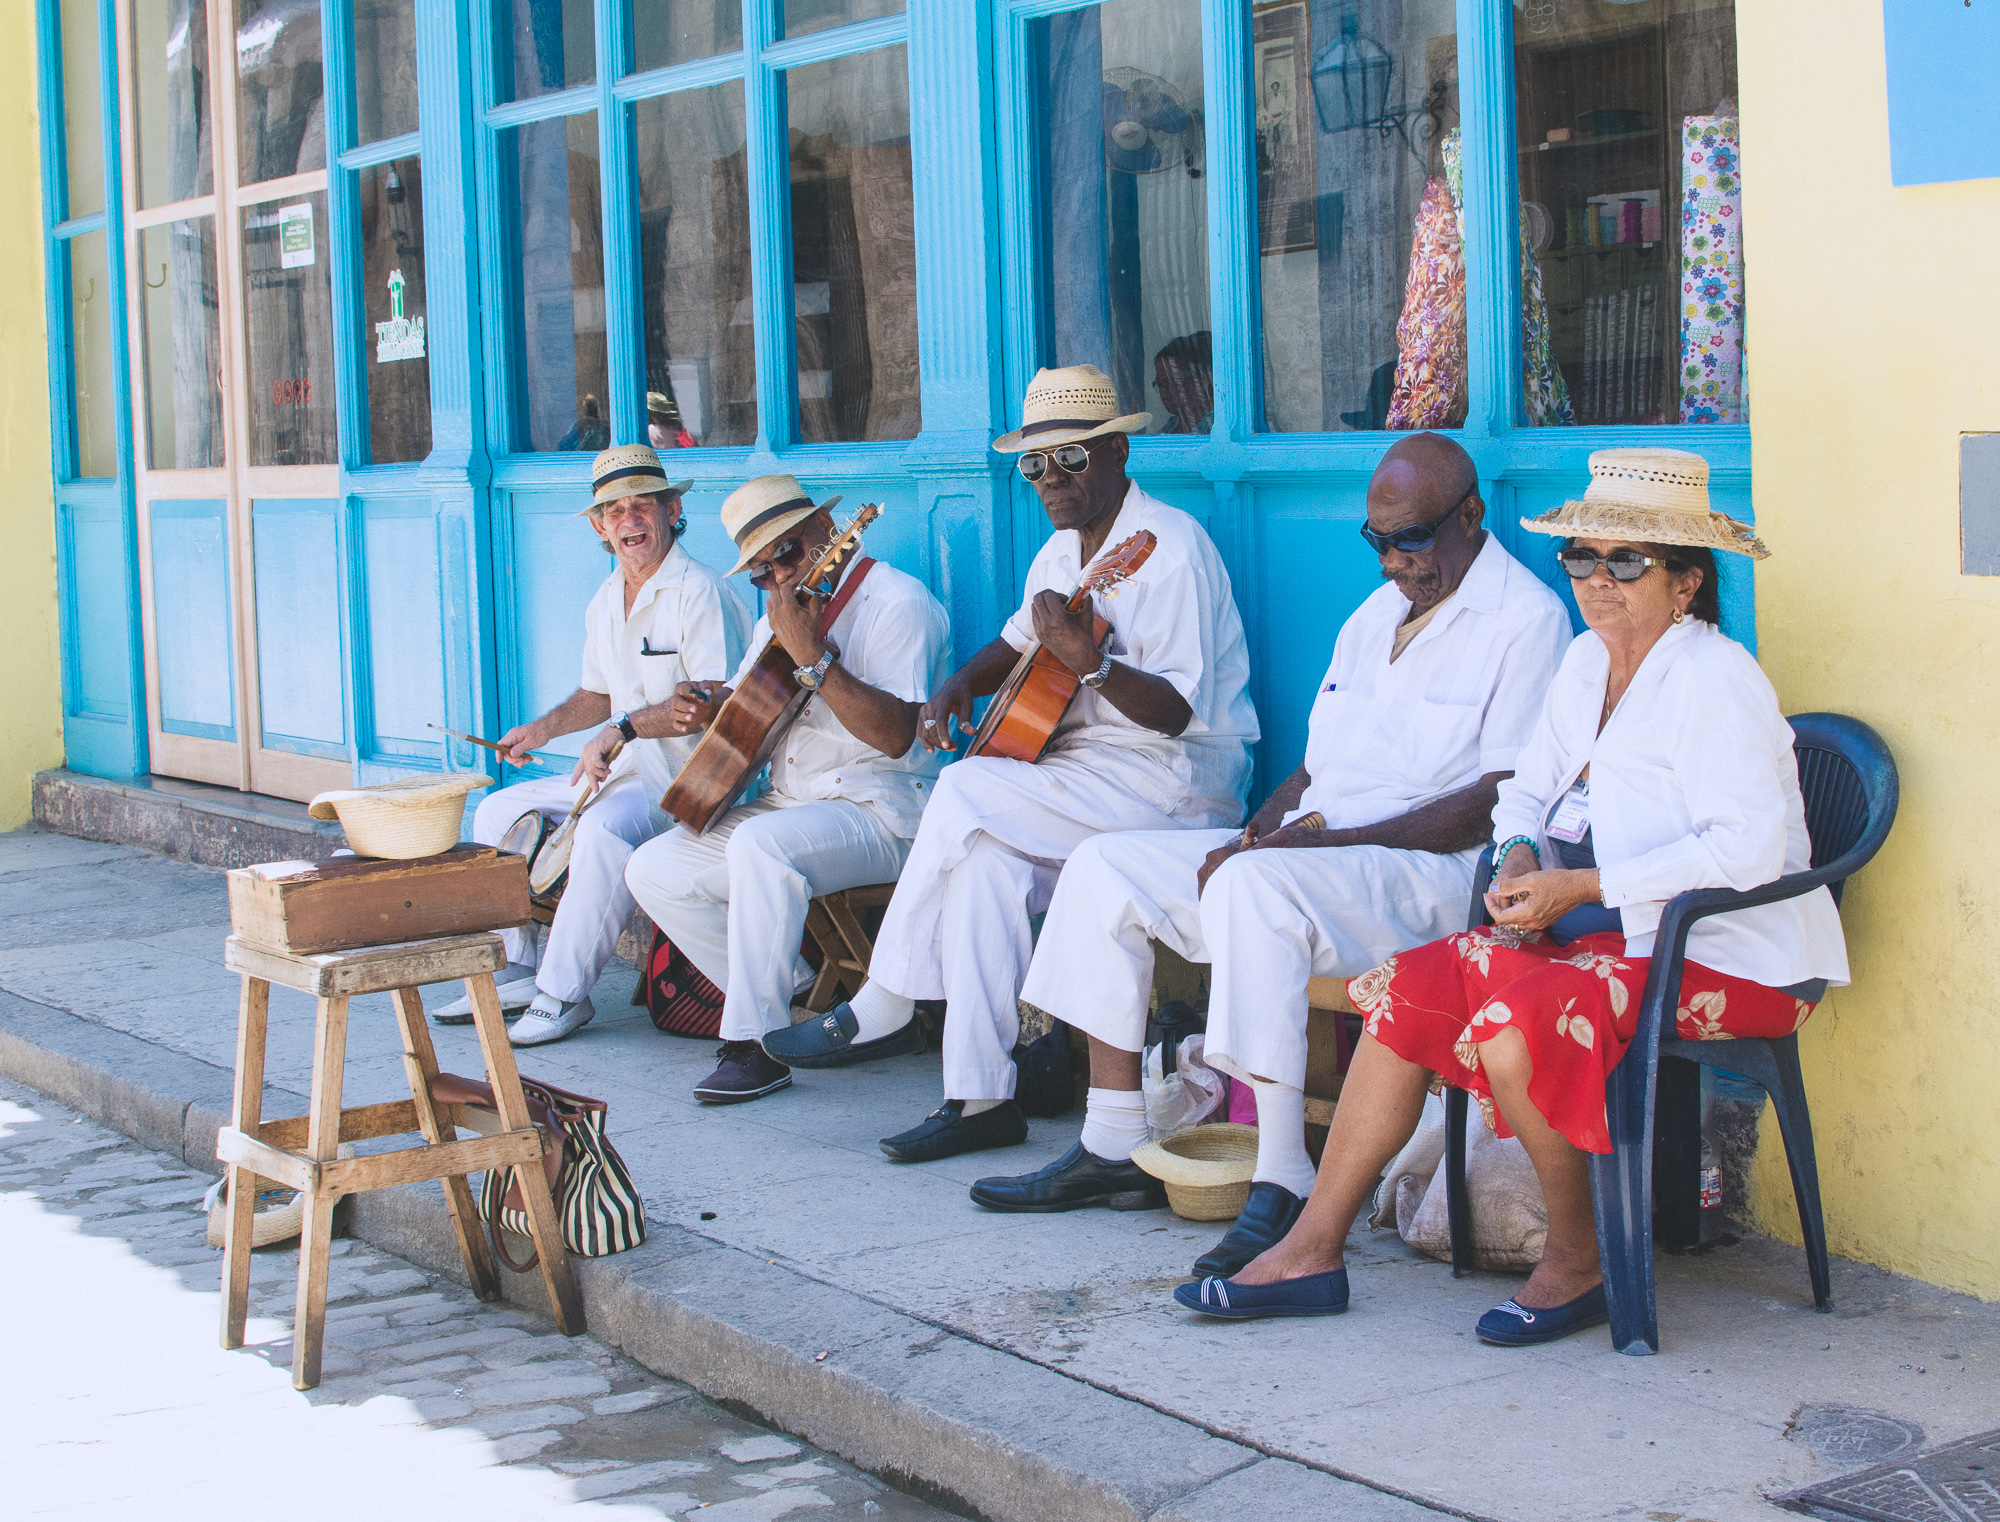 Havana, Cuba  July 2017